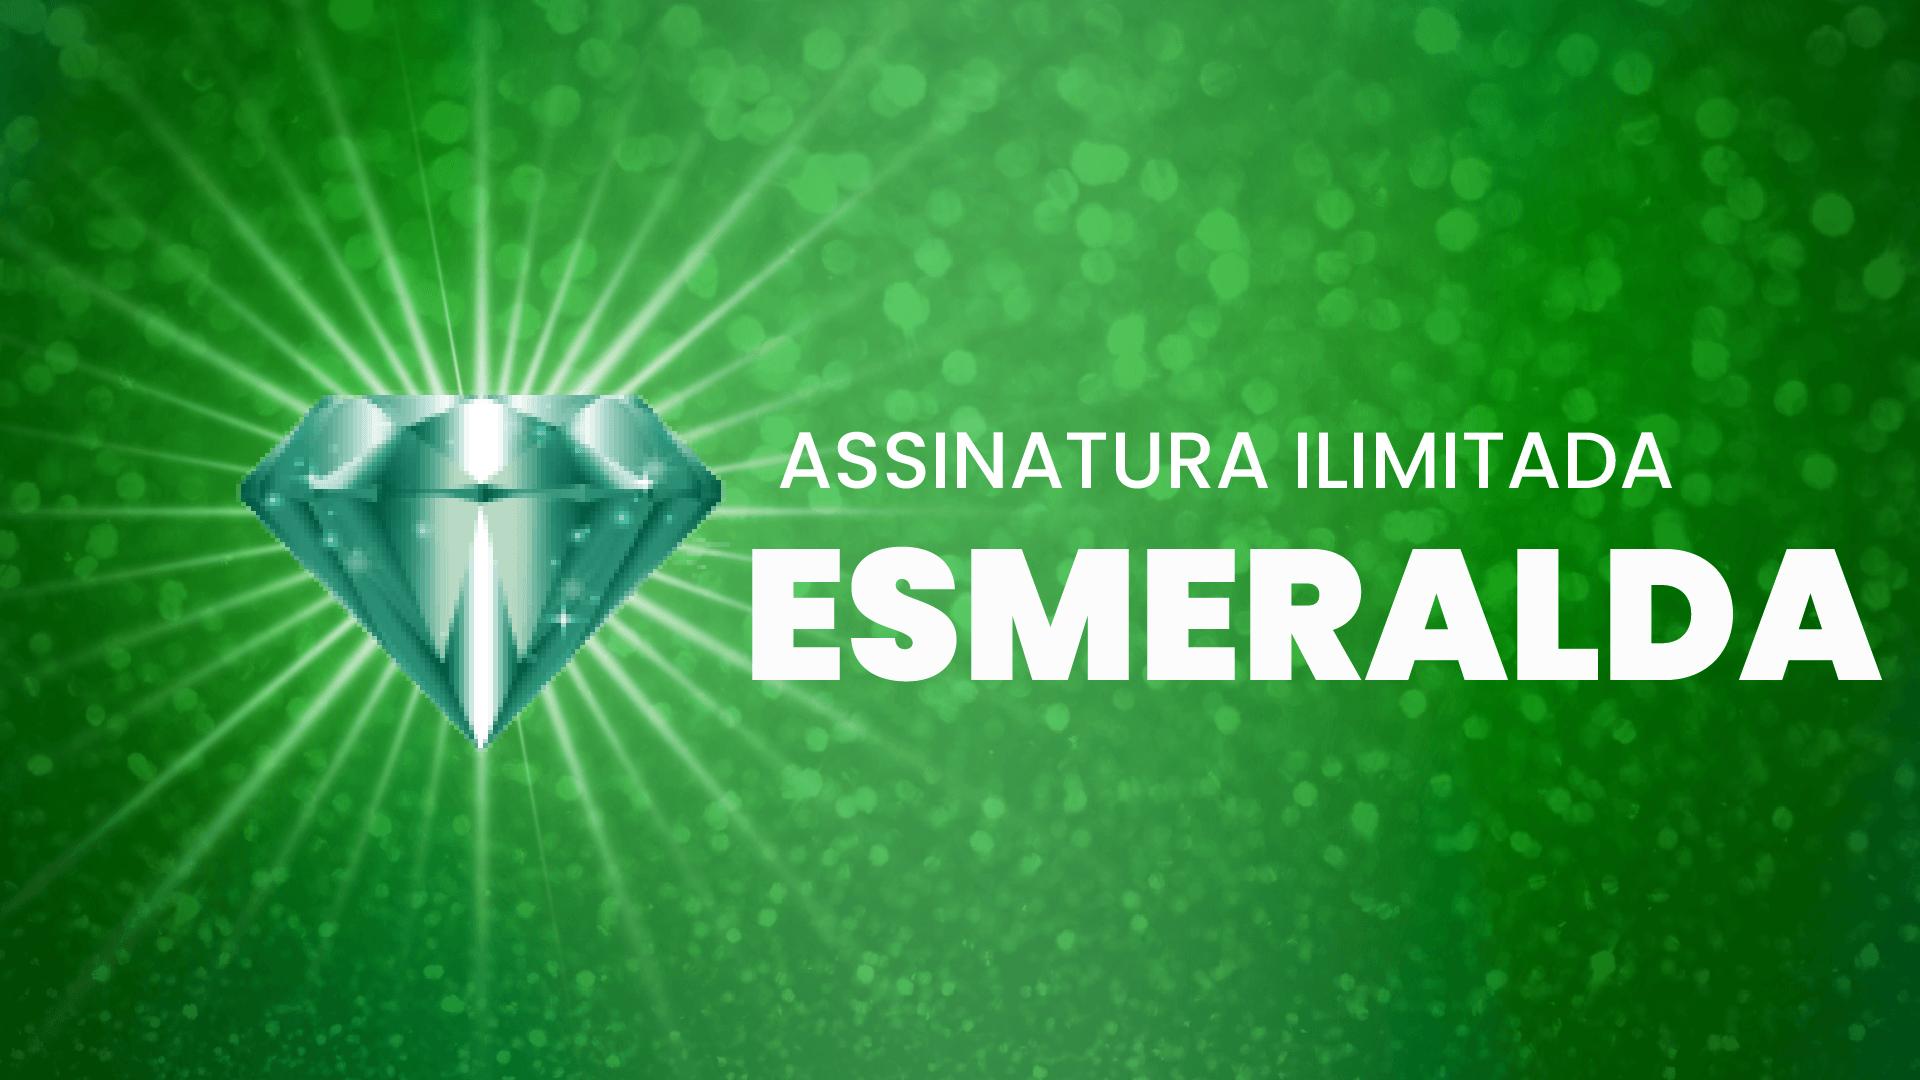 Assinatura Ilimitada Esmeralda - Anual